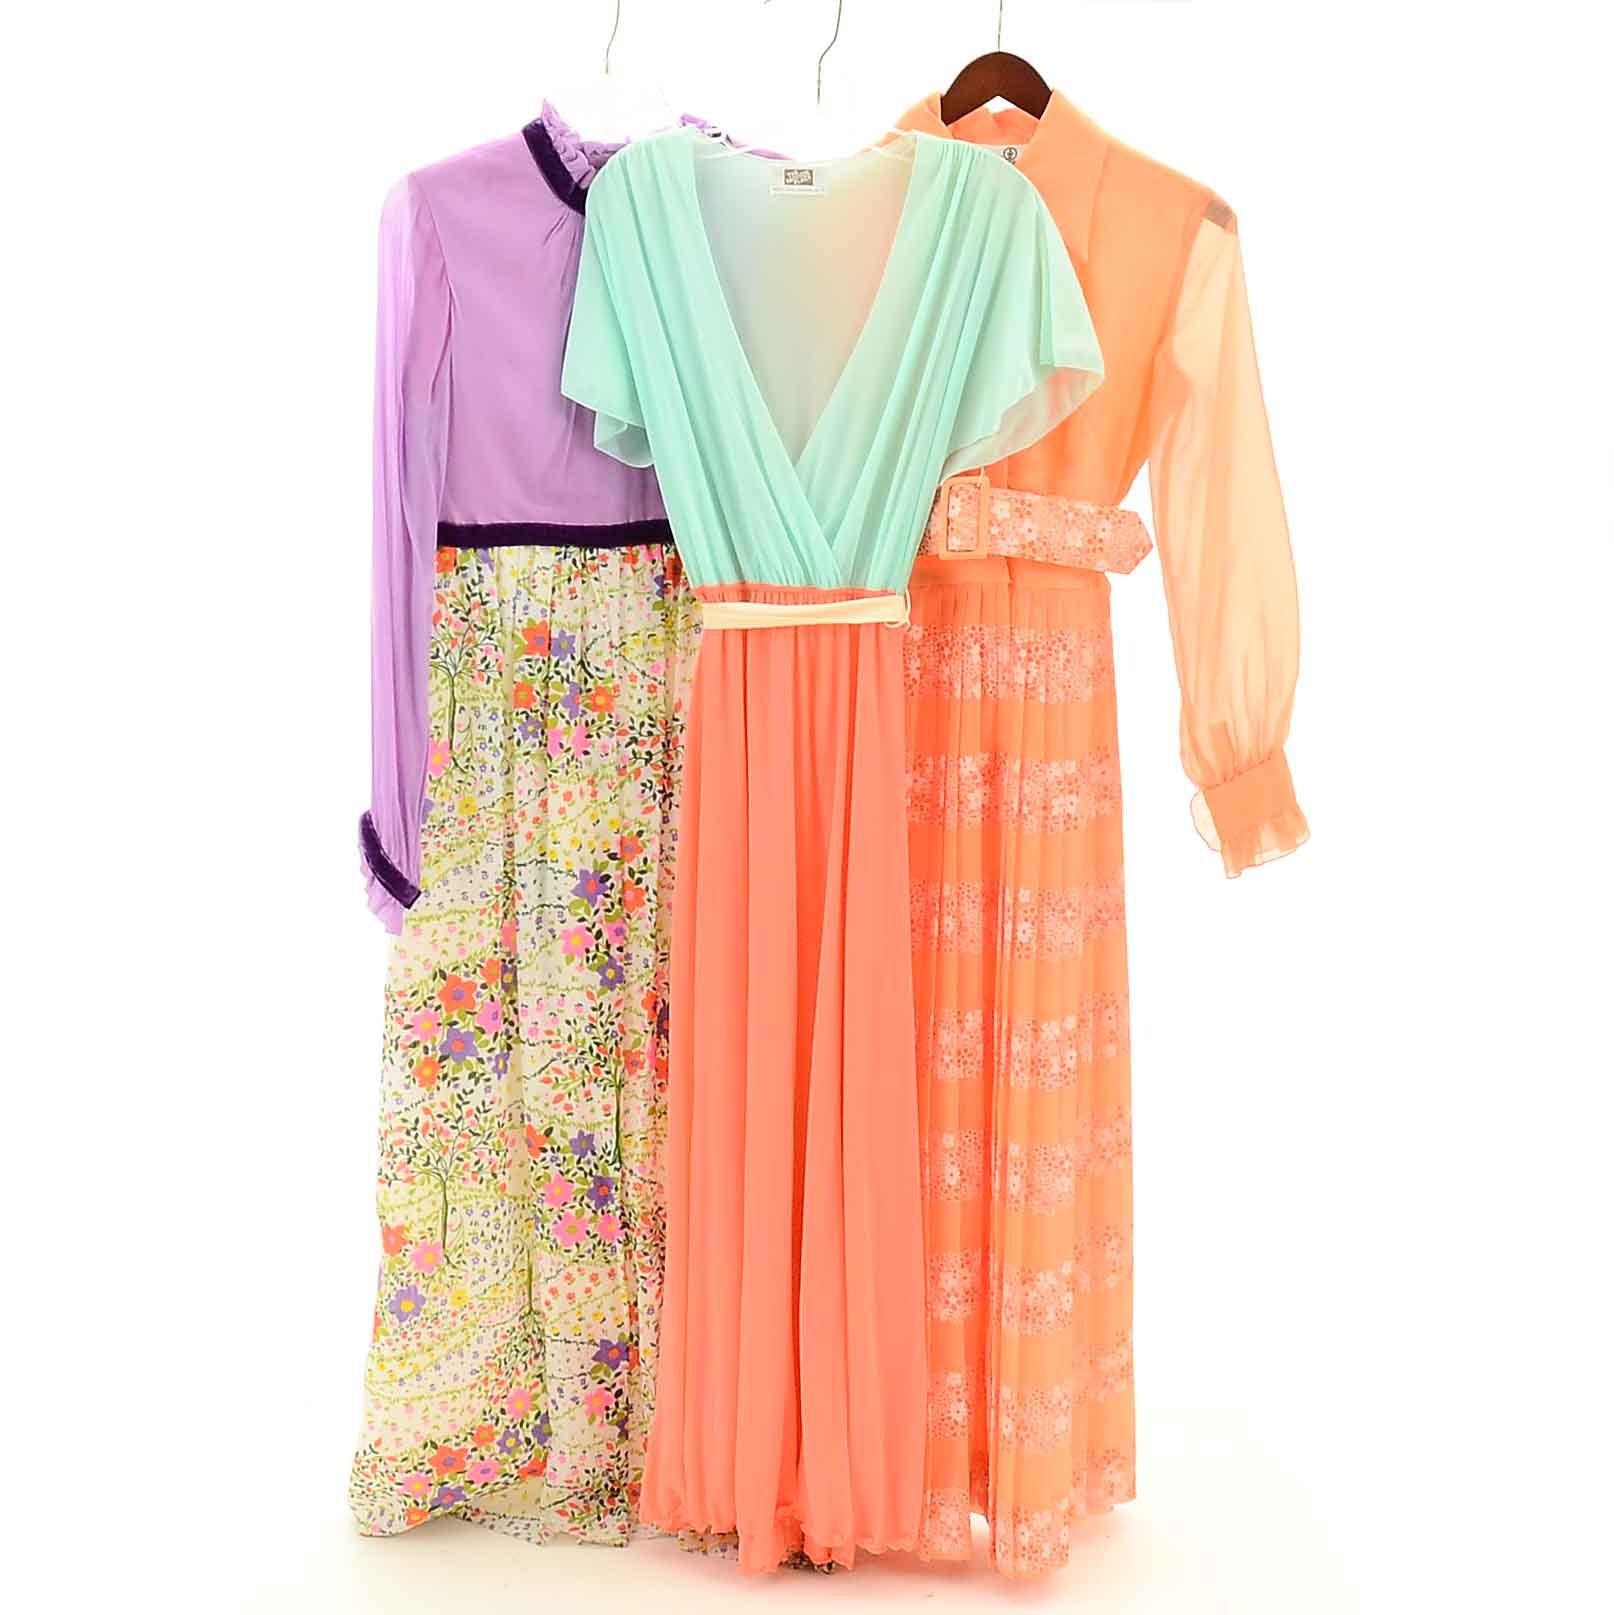 1970s Vintage Pastel Floral Dresses